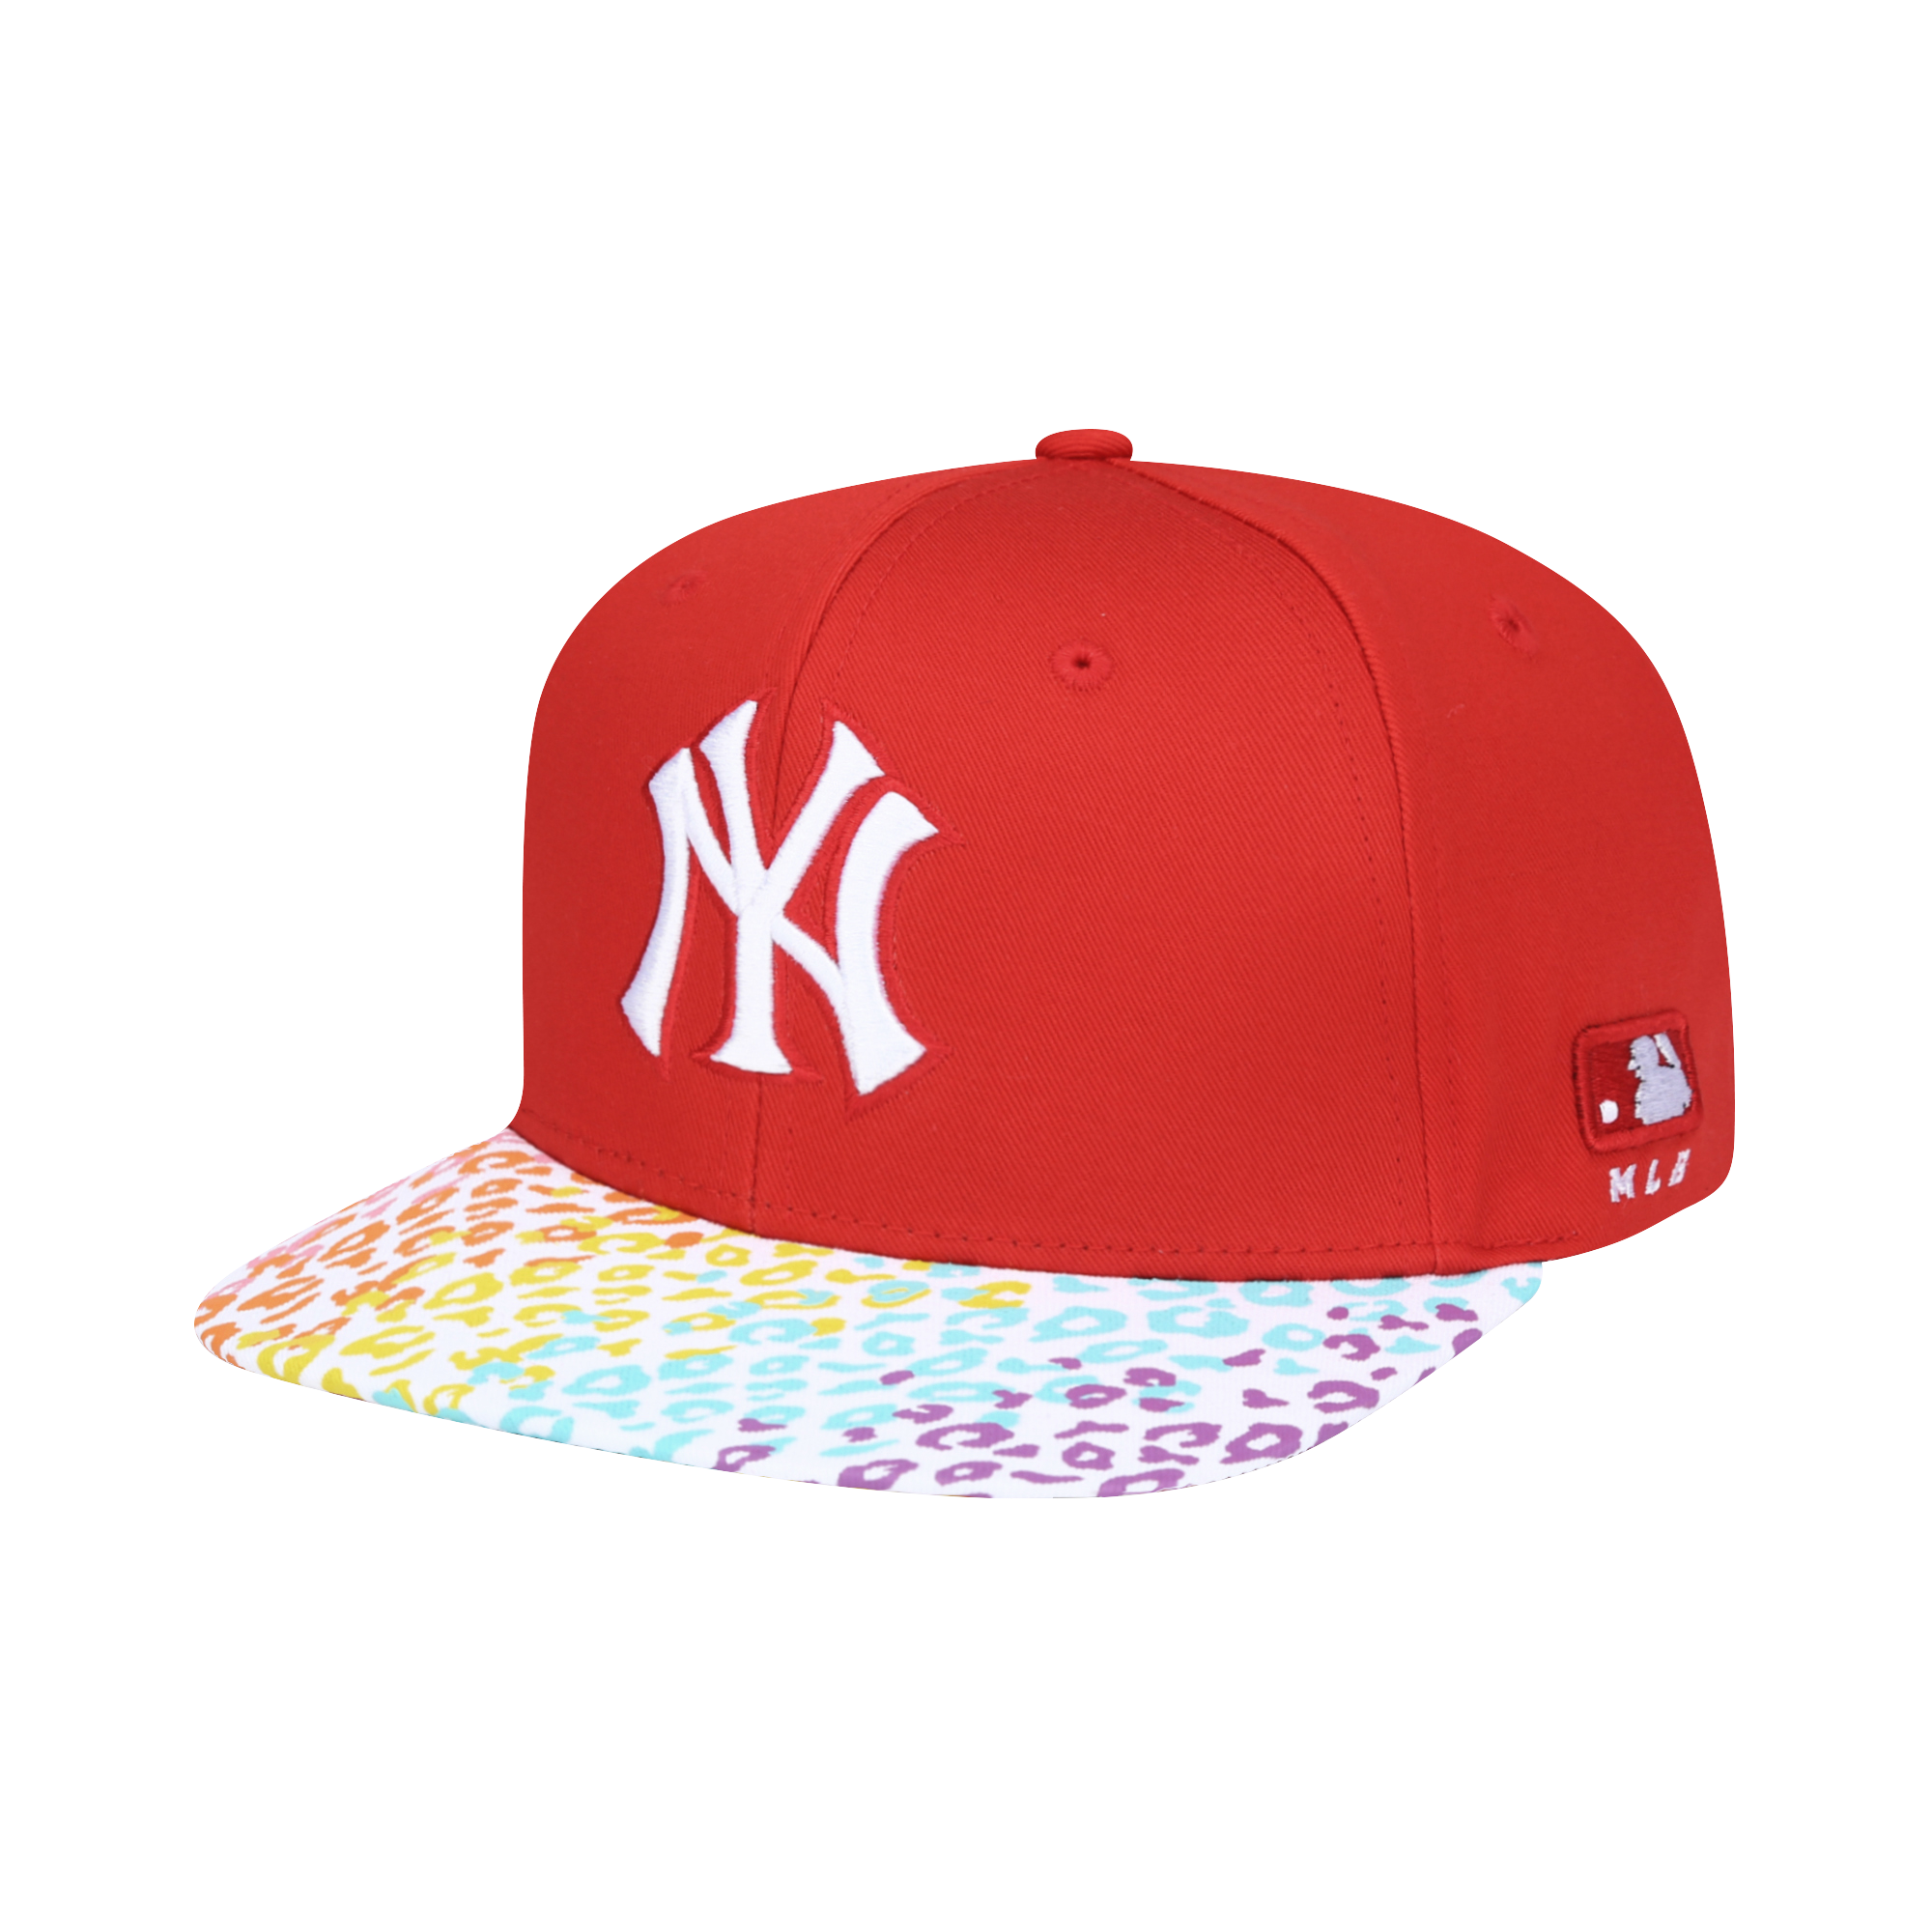 NEW YORK YANKEES RAINBOW DIAGONAL LEOPARD SNAPBACK